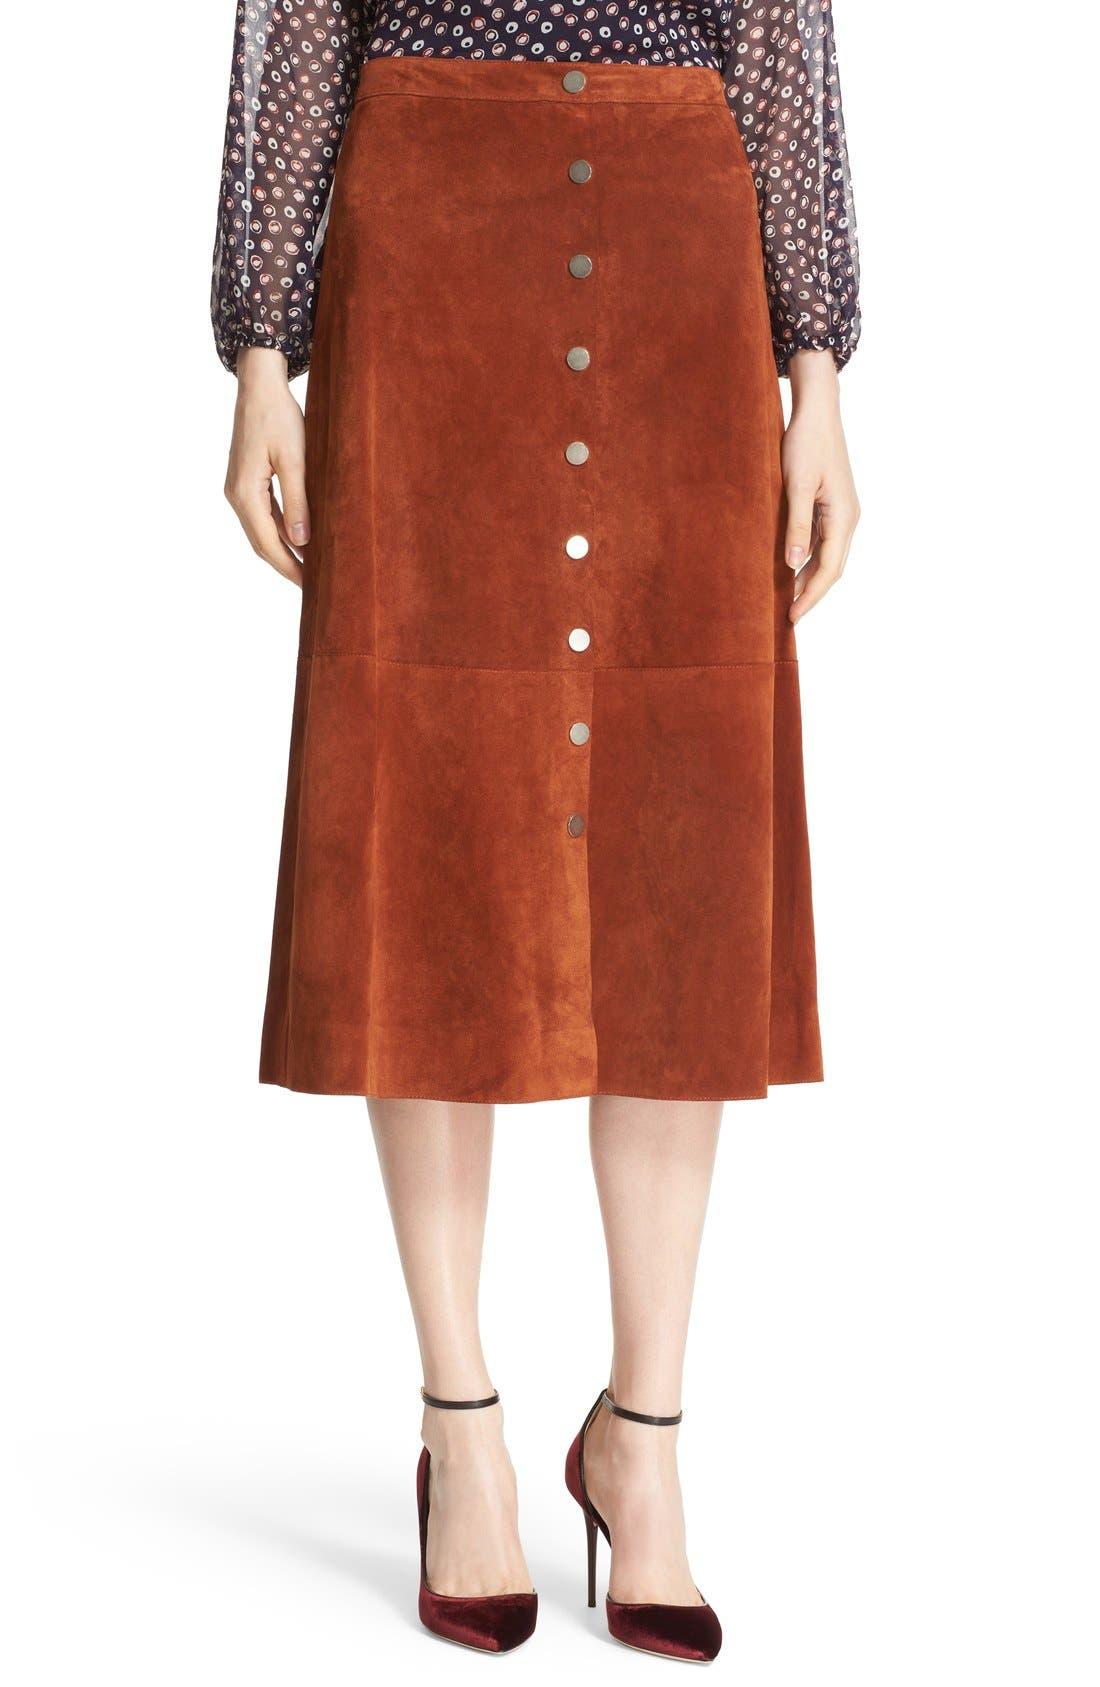 Alternate Image 1 Selected - Diane von Furstenberg 'Gracelynn' Suede Midi Skirt